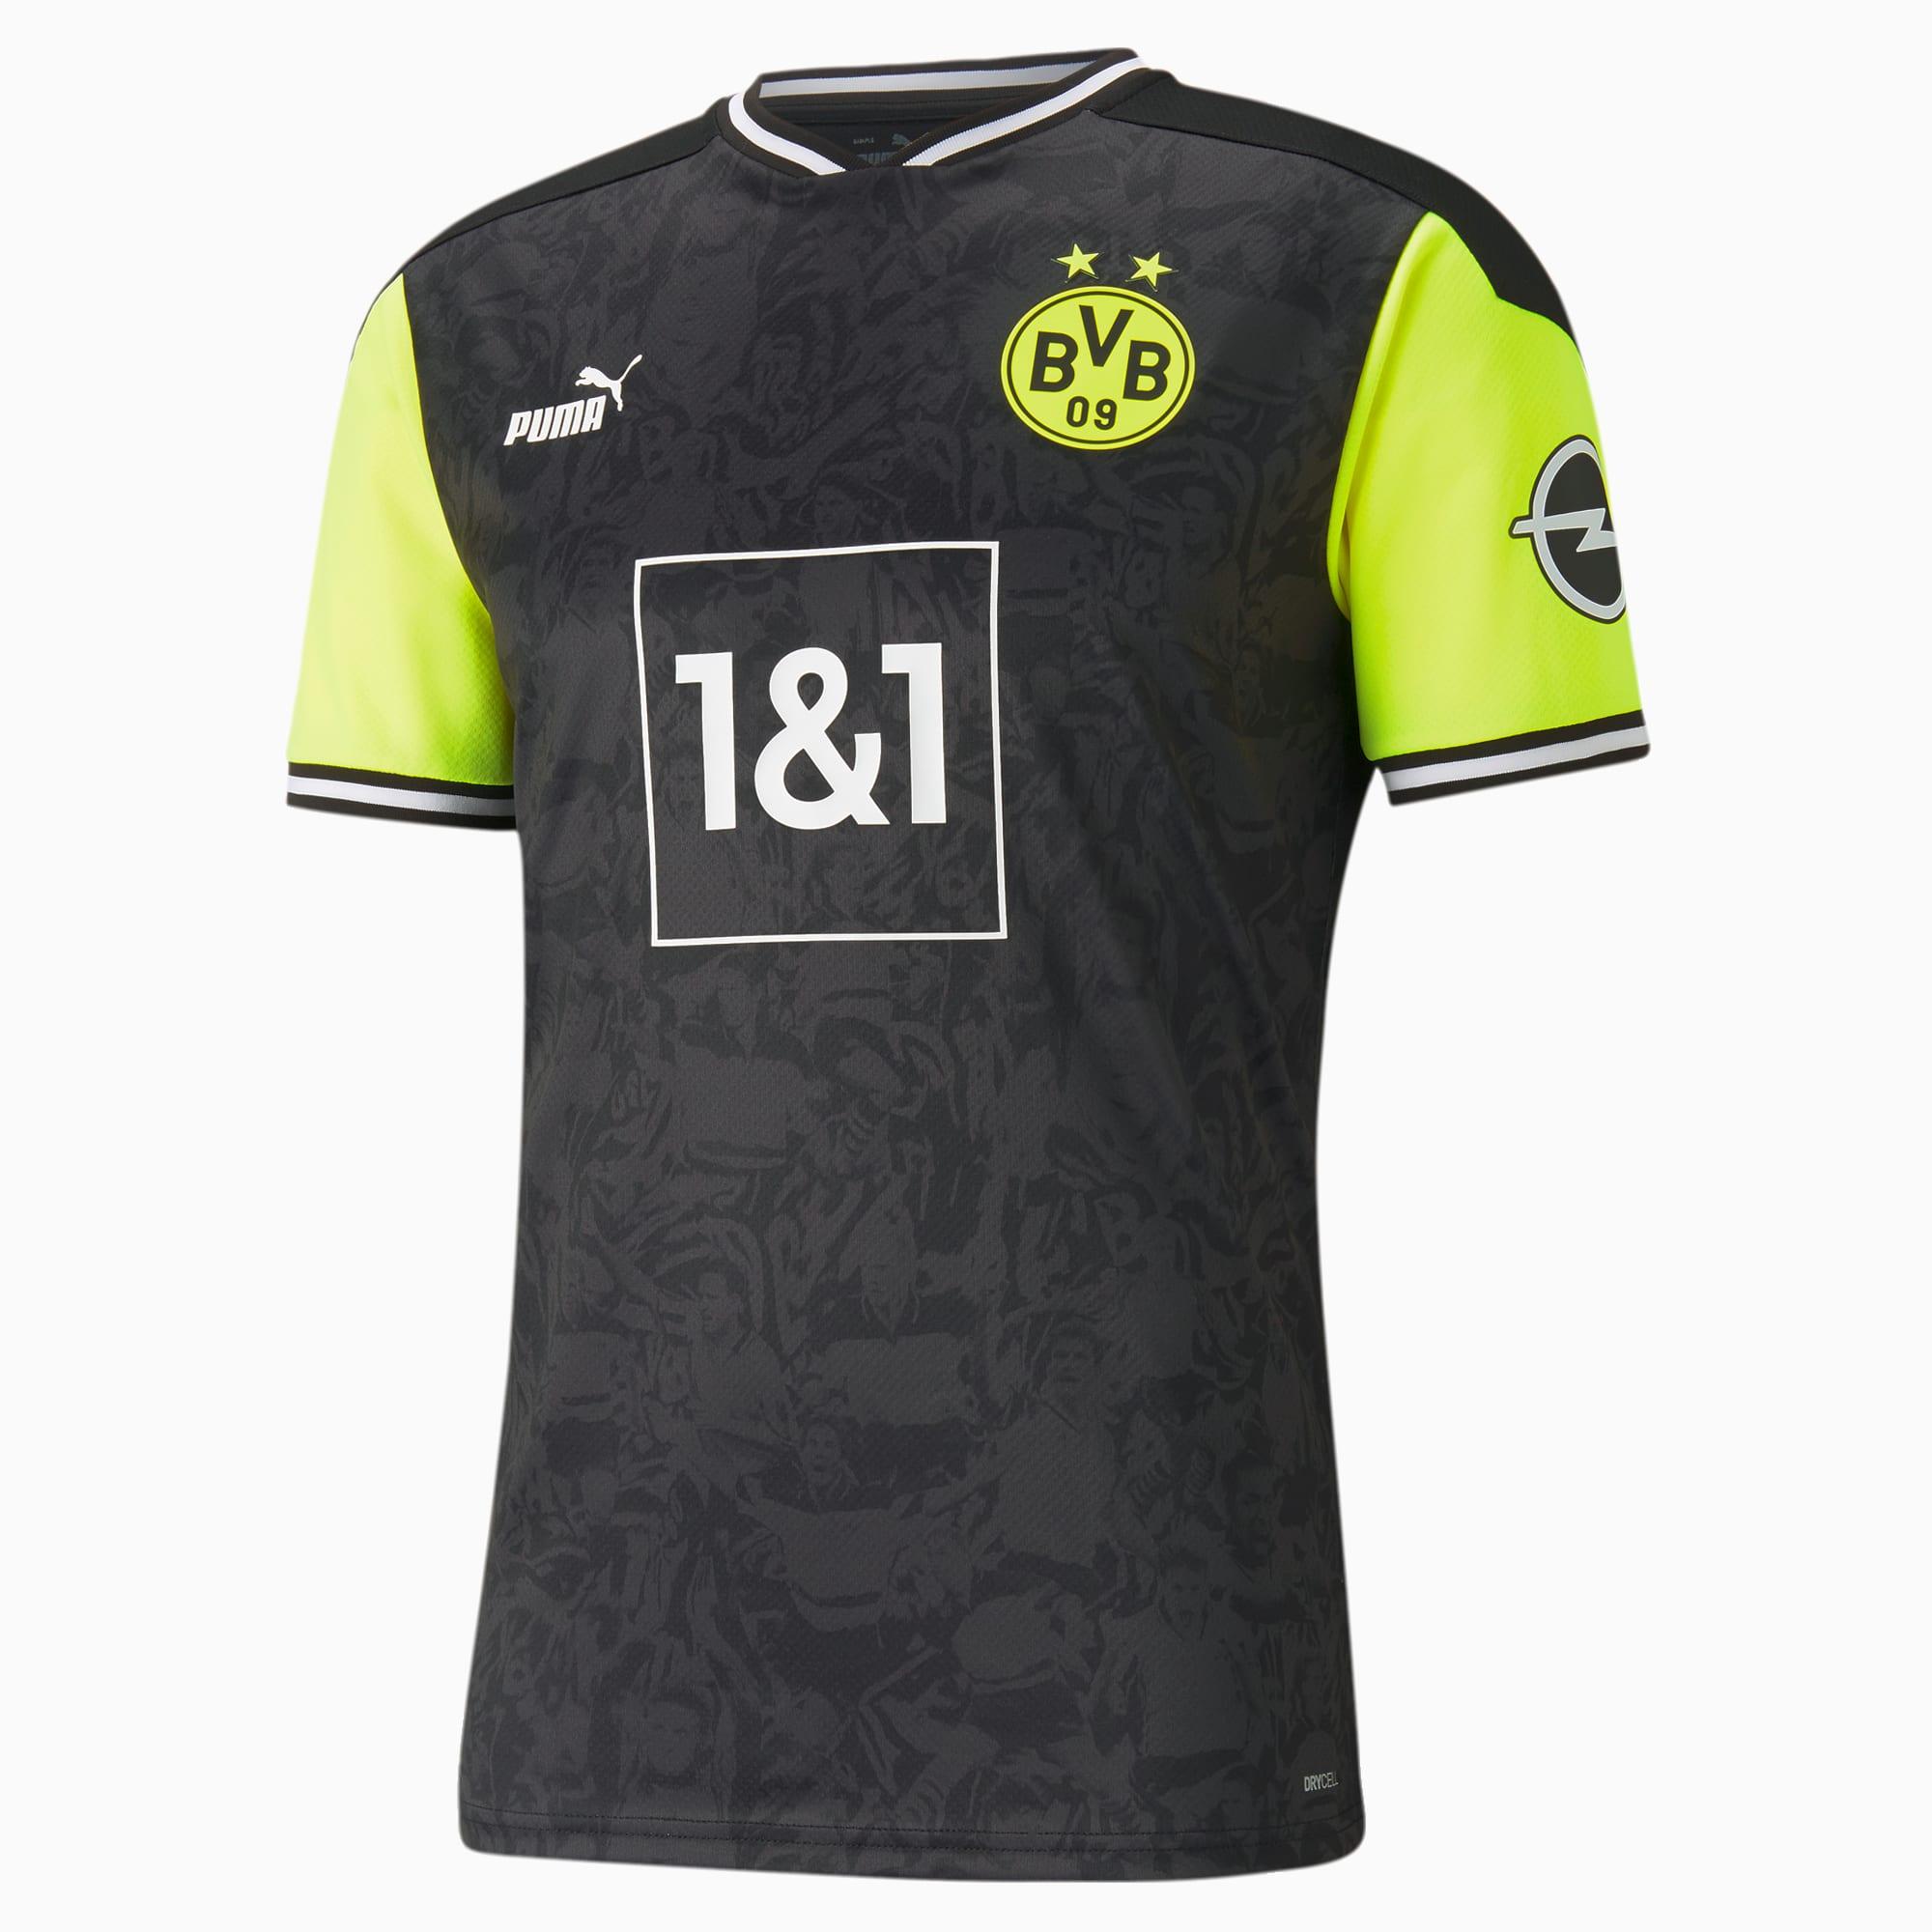 BVB Borussia Dortmund Sonder Neon Retro Trikot für 84,99€ @ BVB Shop